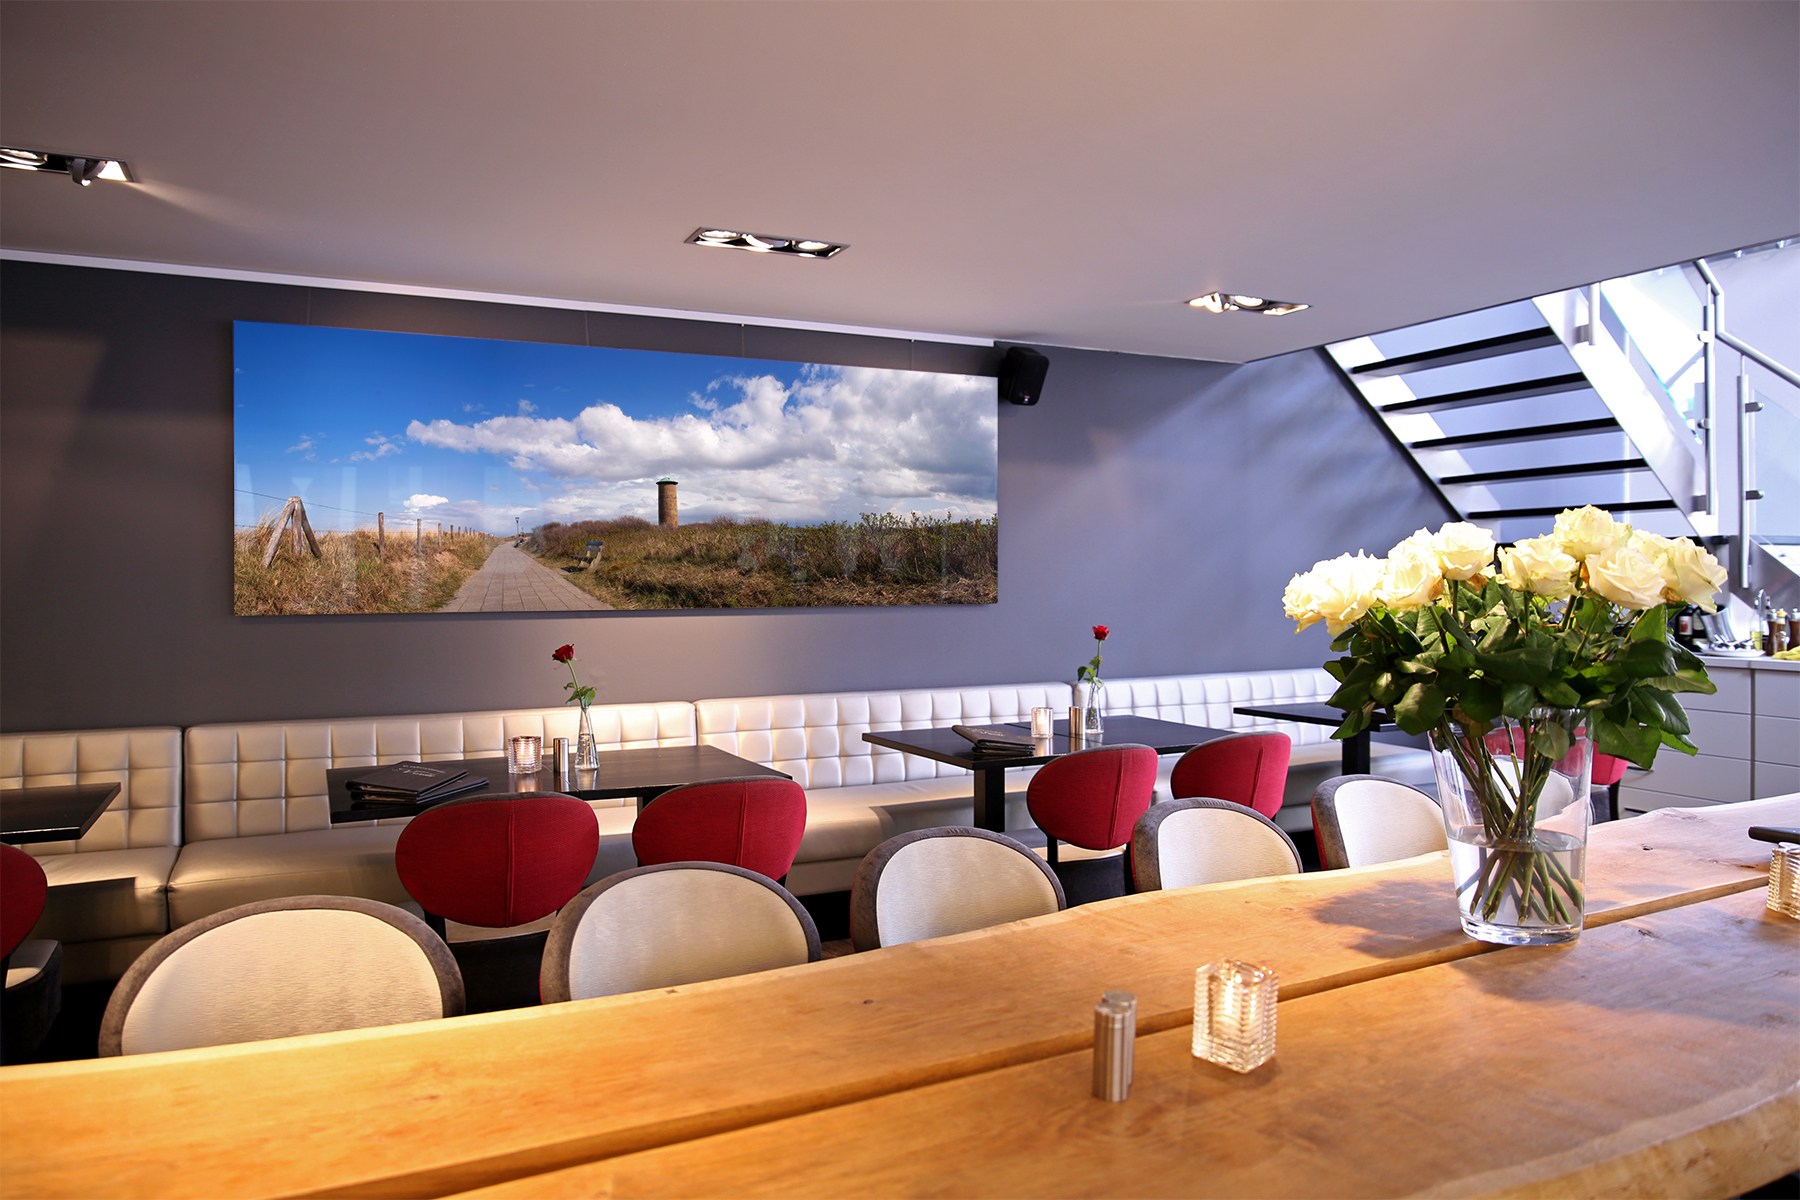 Commission for Restaurant Verdi, Domburg (10 large format prints in Liquid Gloss finish)